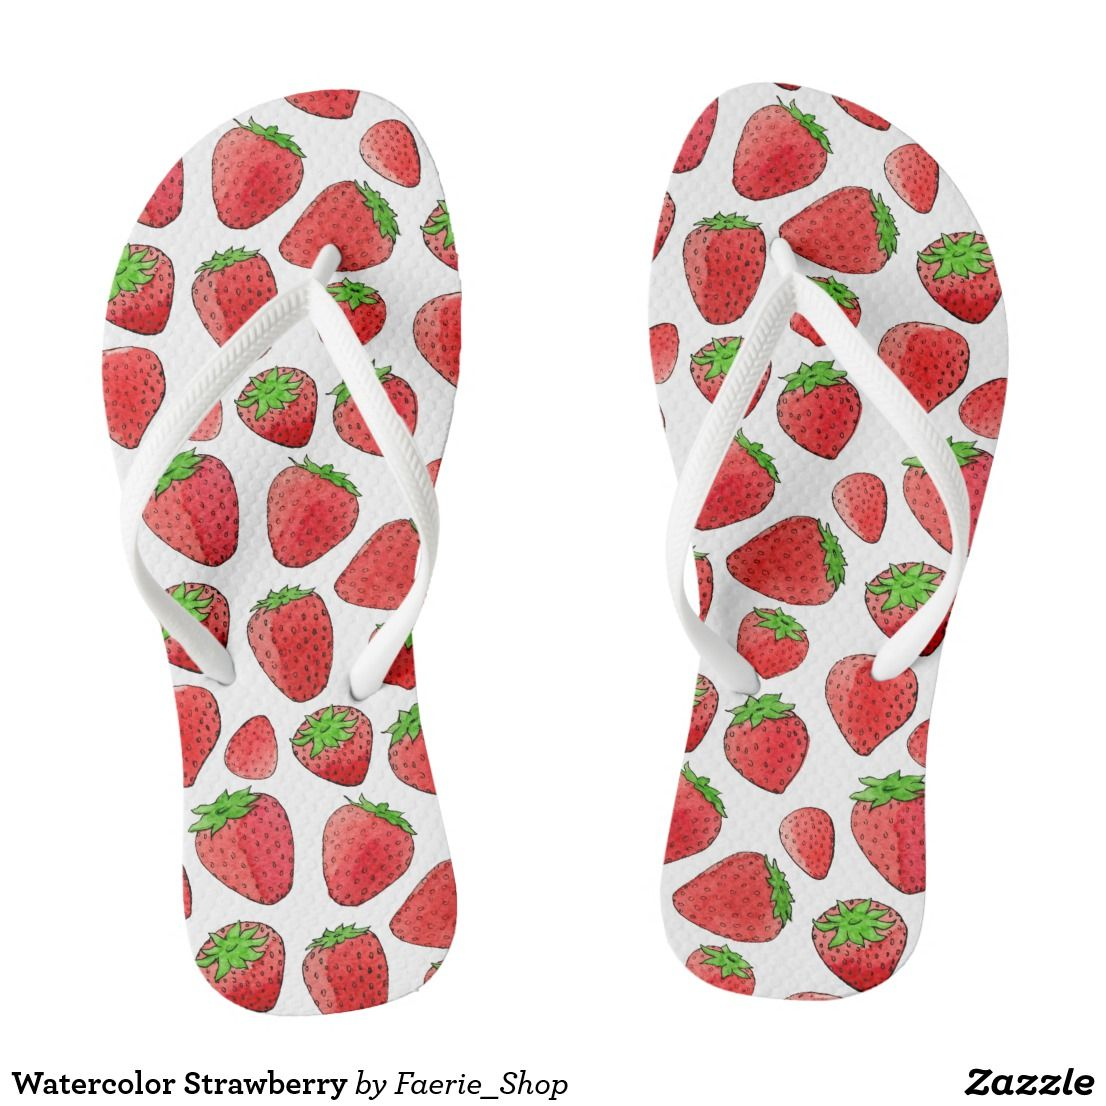 6ea6cb2d972ce4 Watercolor Strawberry Flip Flops  faerieshop  watercolour  strawberry   sketch  pattern  red  ink  berry  summer  beautiful  zazzle